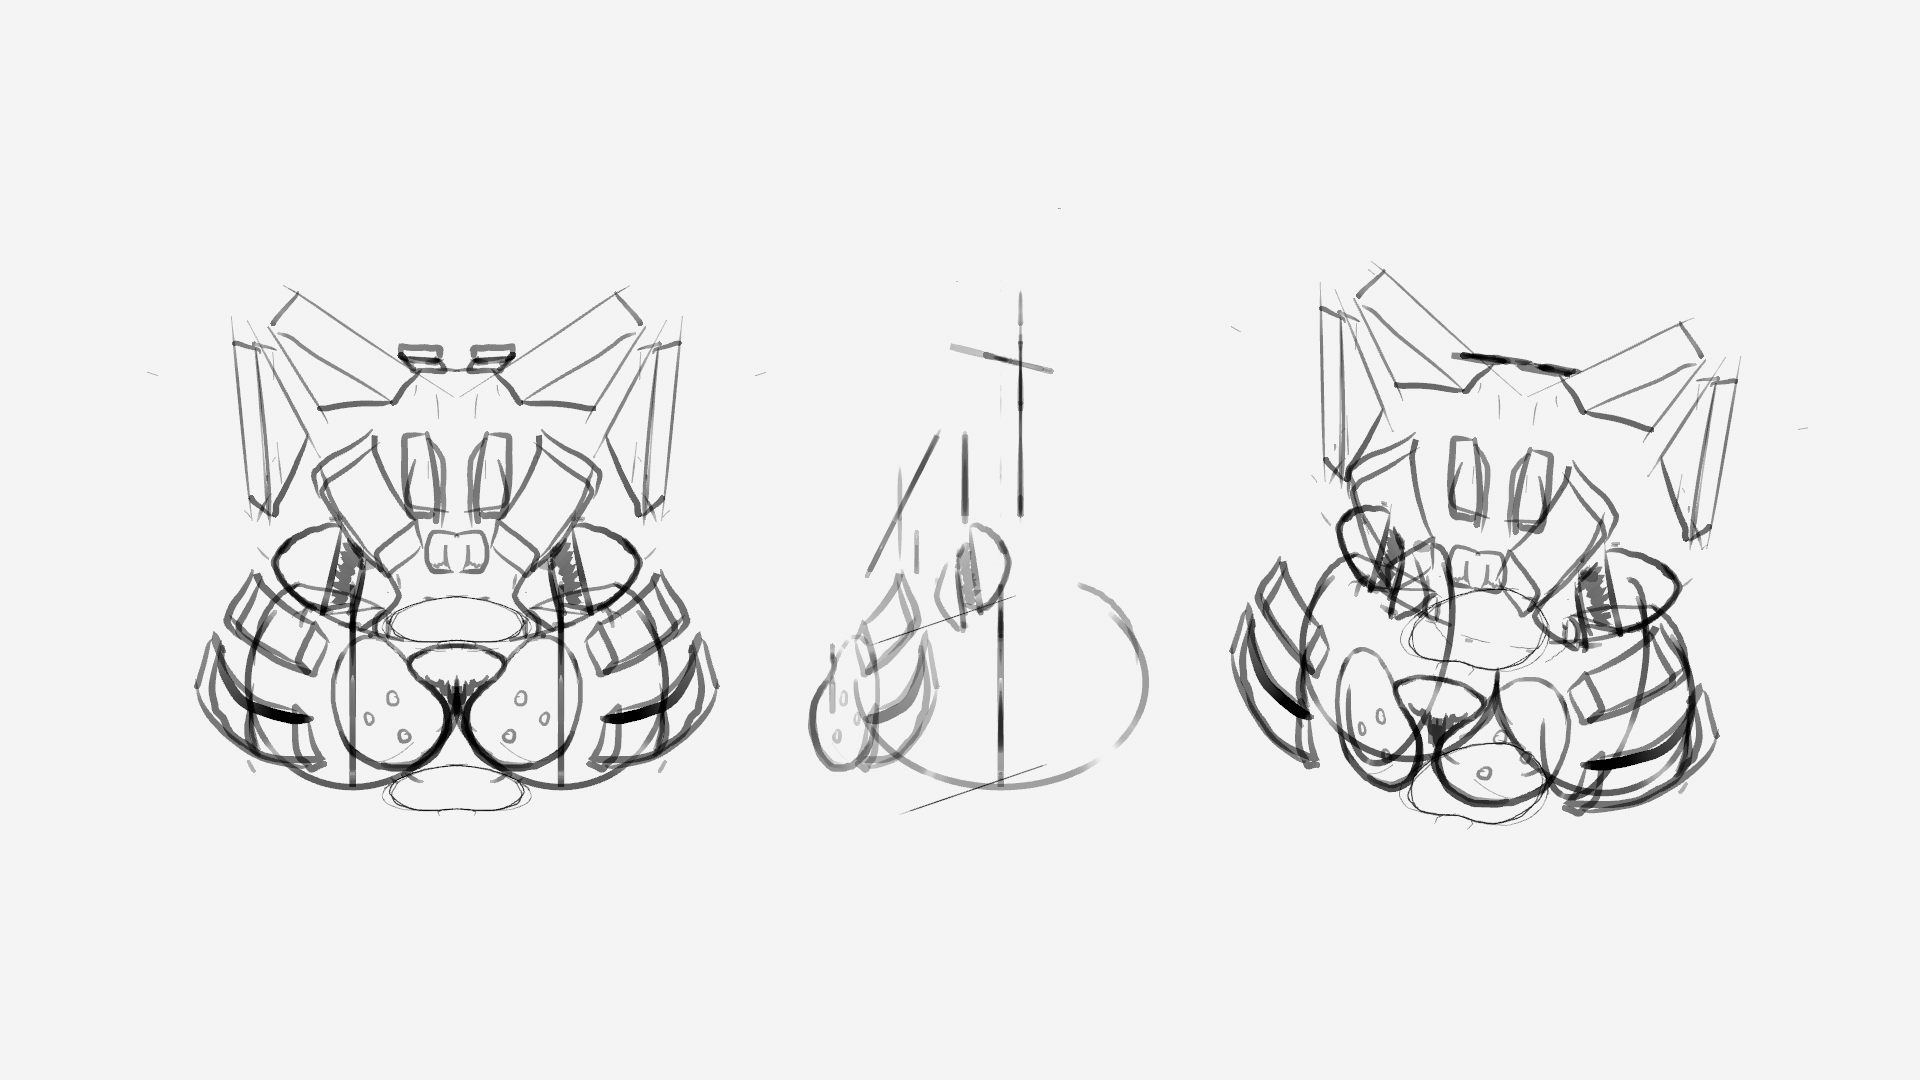 sketches grease pencil 3D maneki neko  hand-drawn illustration